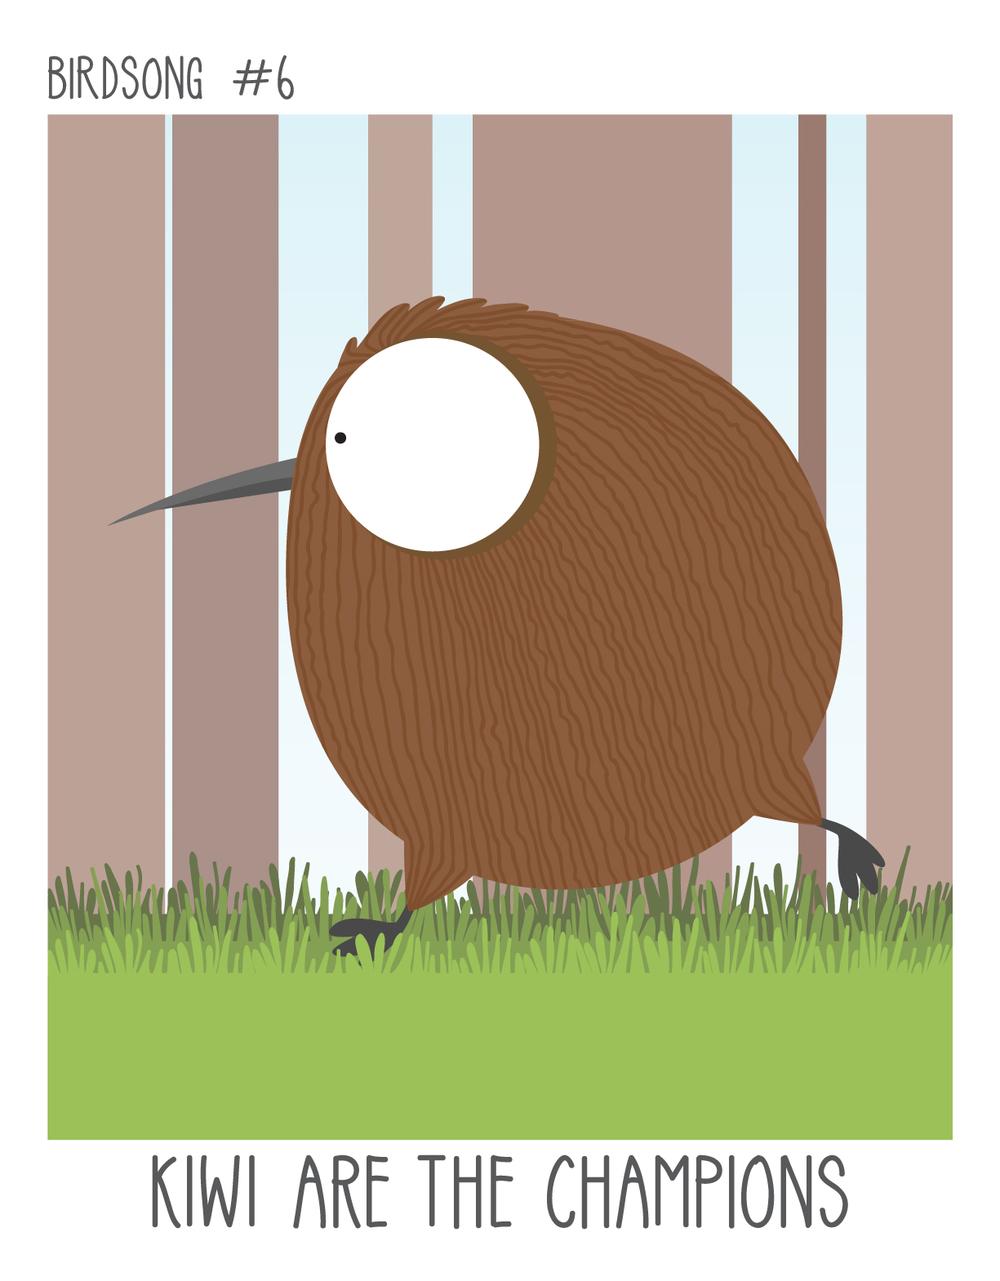 Bird song #6 Kiwi.jpg